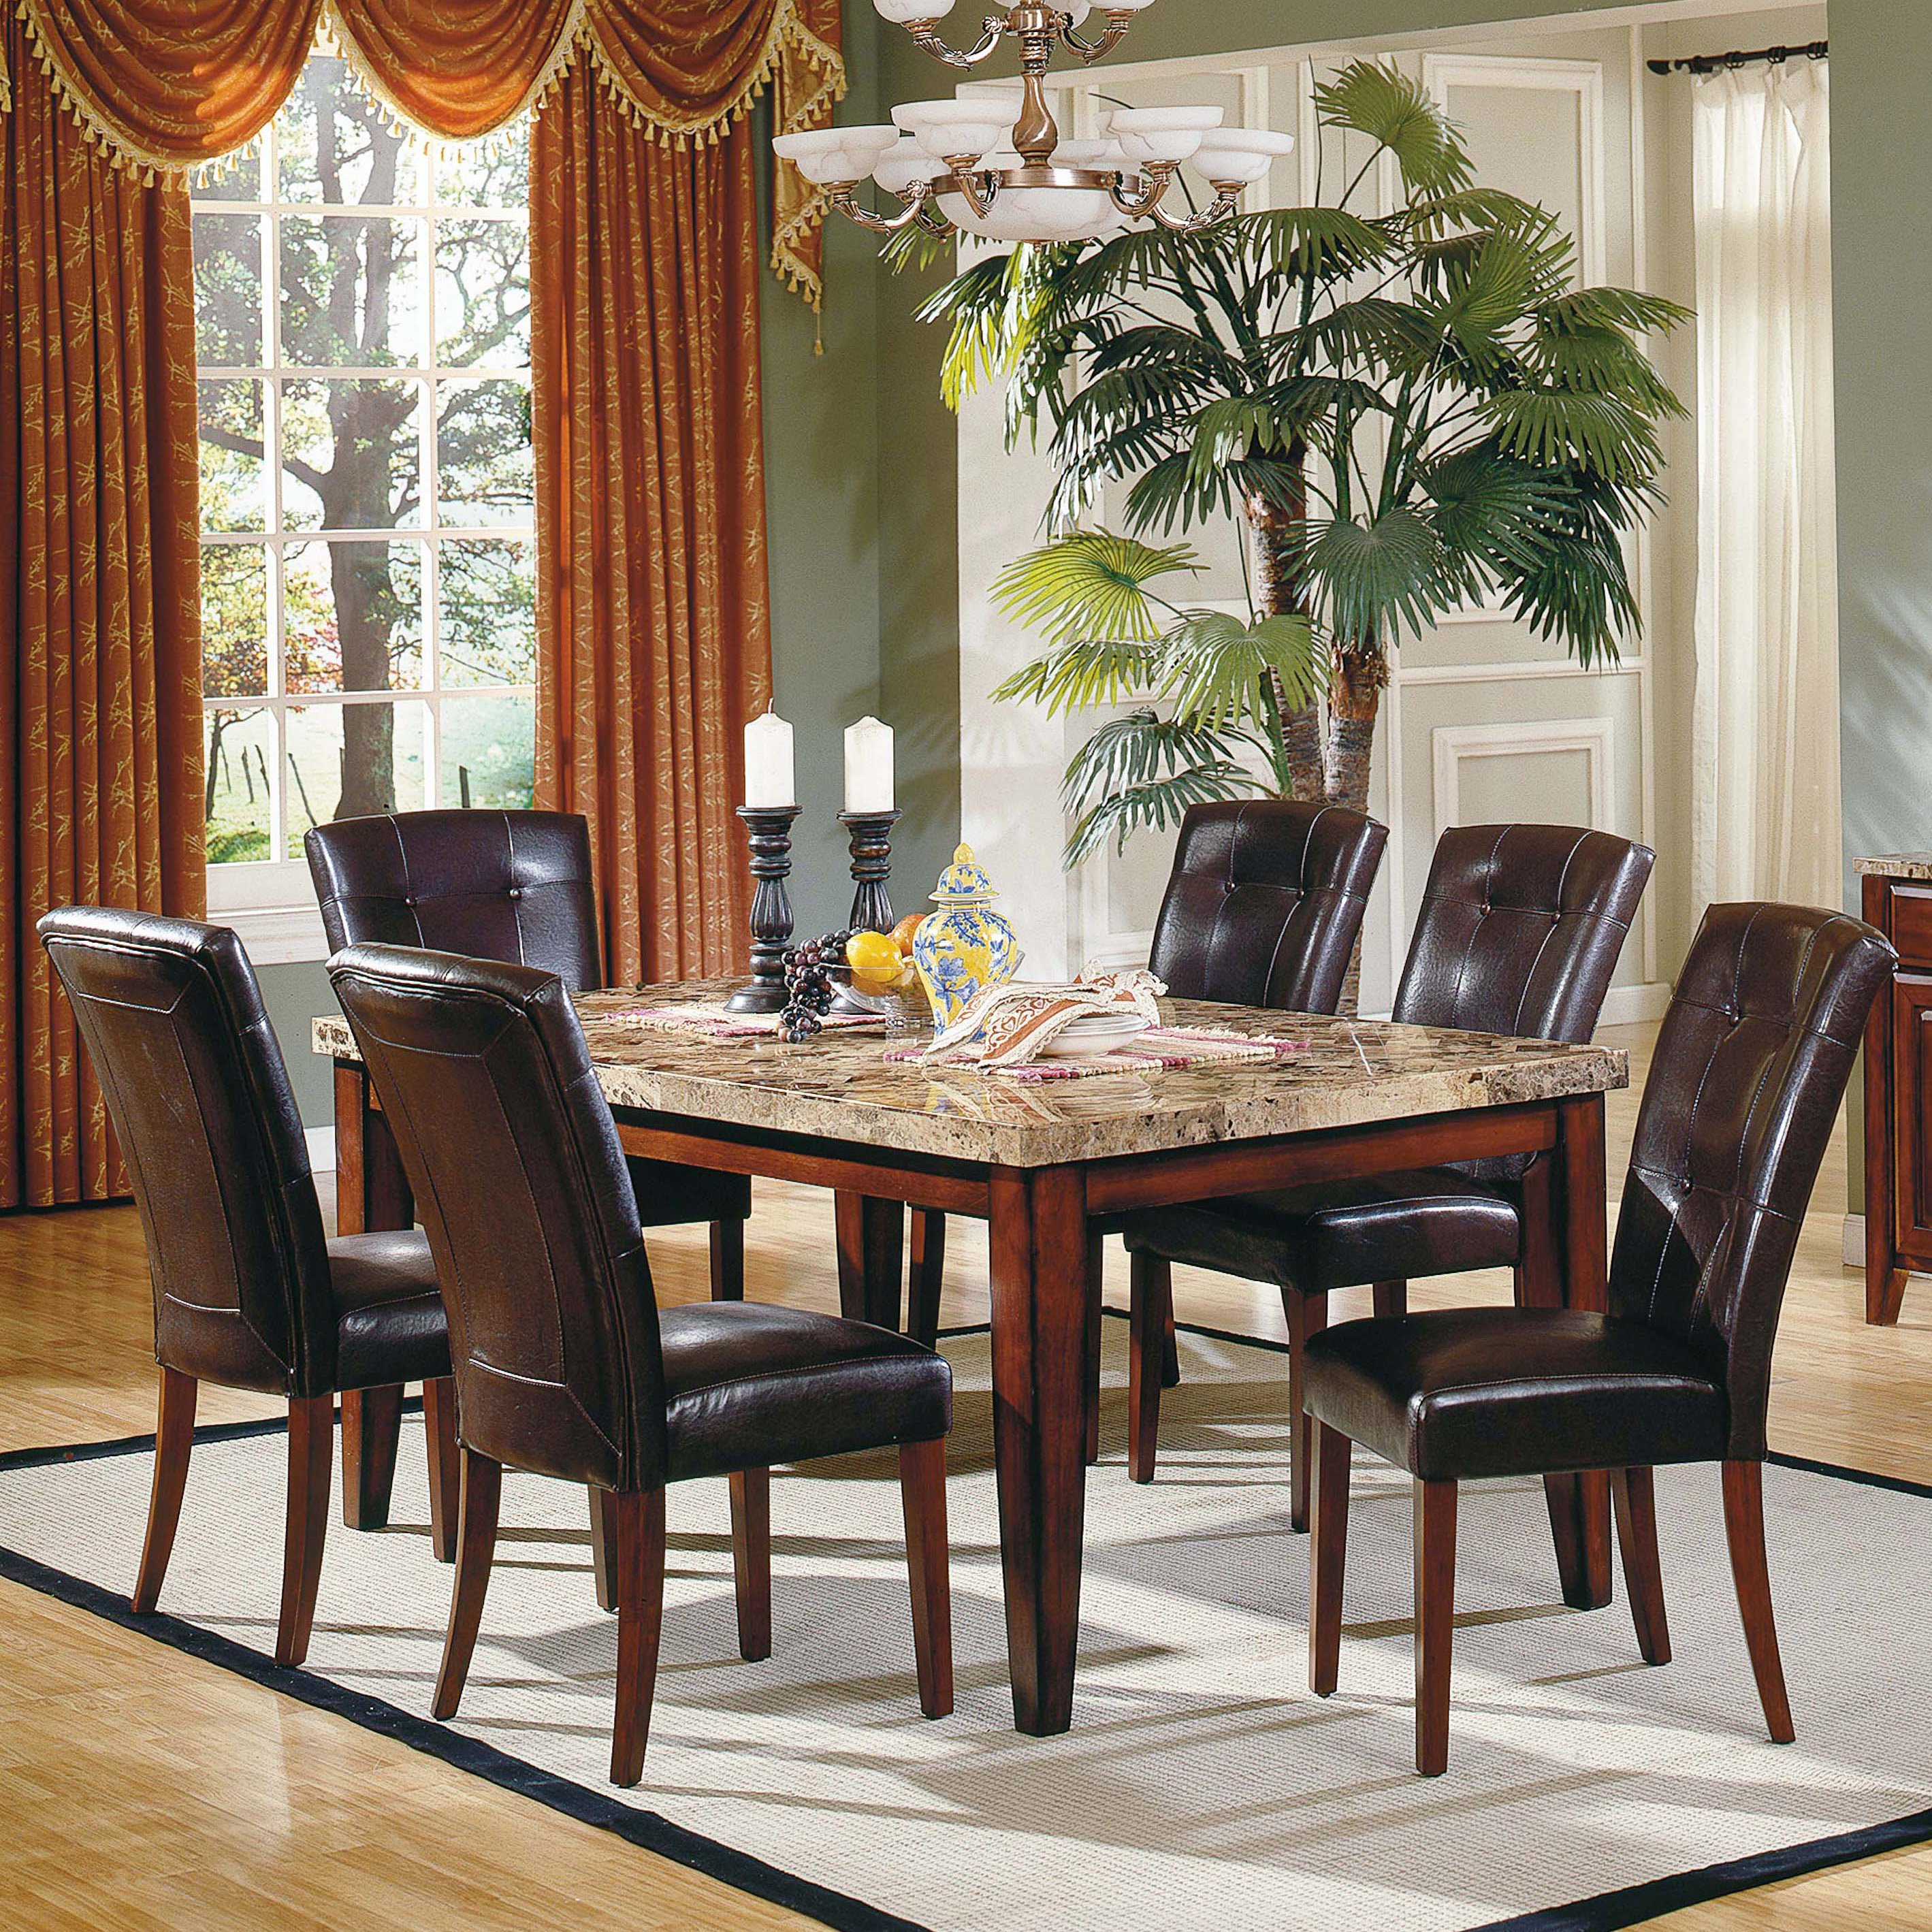 Steve Silver Montibello 7 Piece Marble Top Rectangular Dining Set